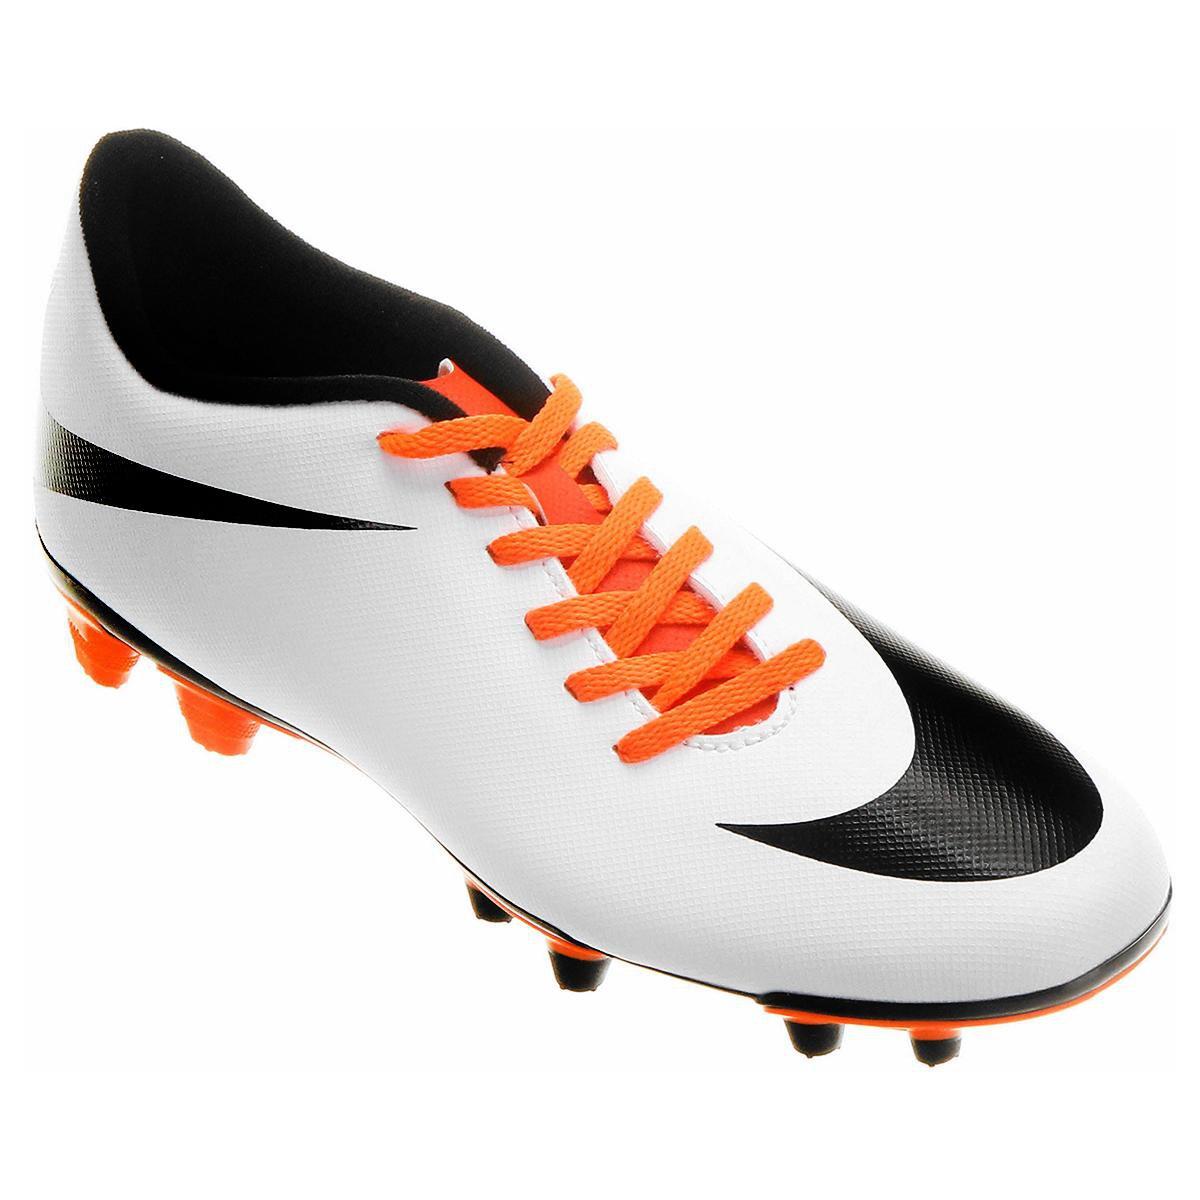 a57a163c7ac52 Chuteira Campo Nike Bravata FG - Branco e Preto   Loja do Inter